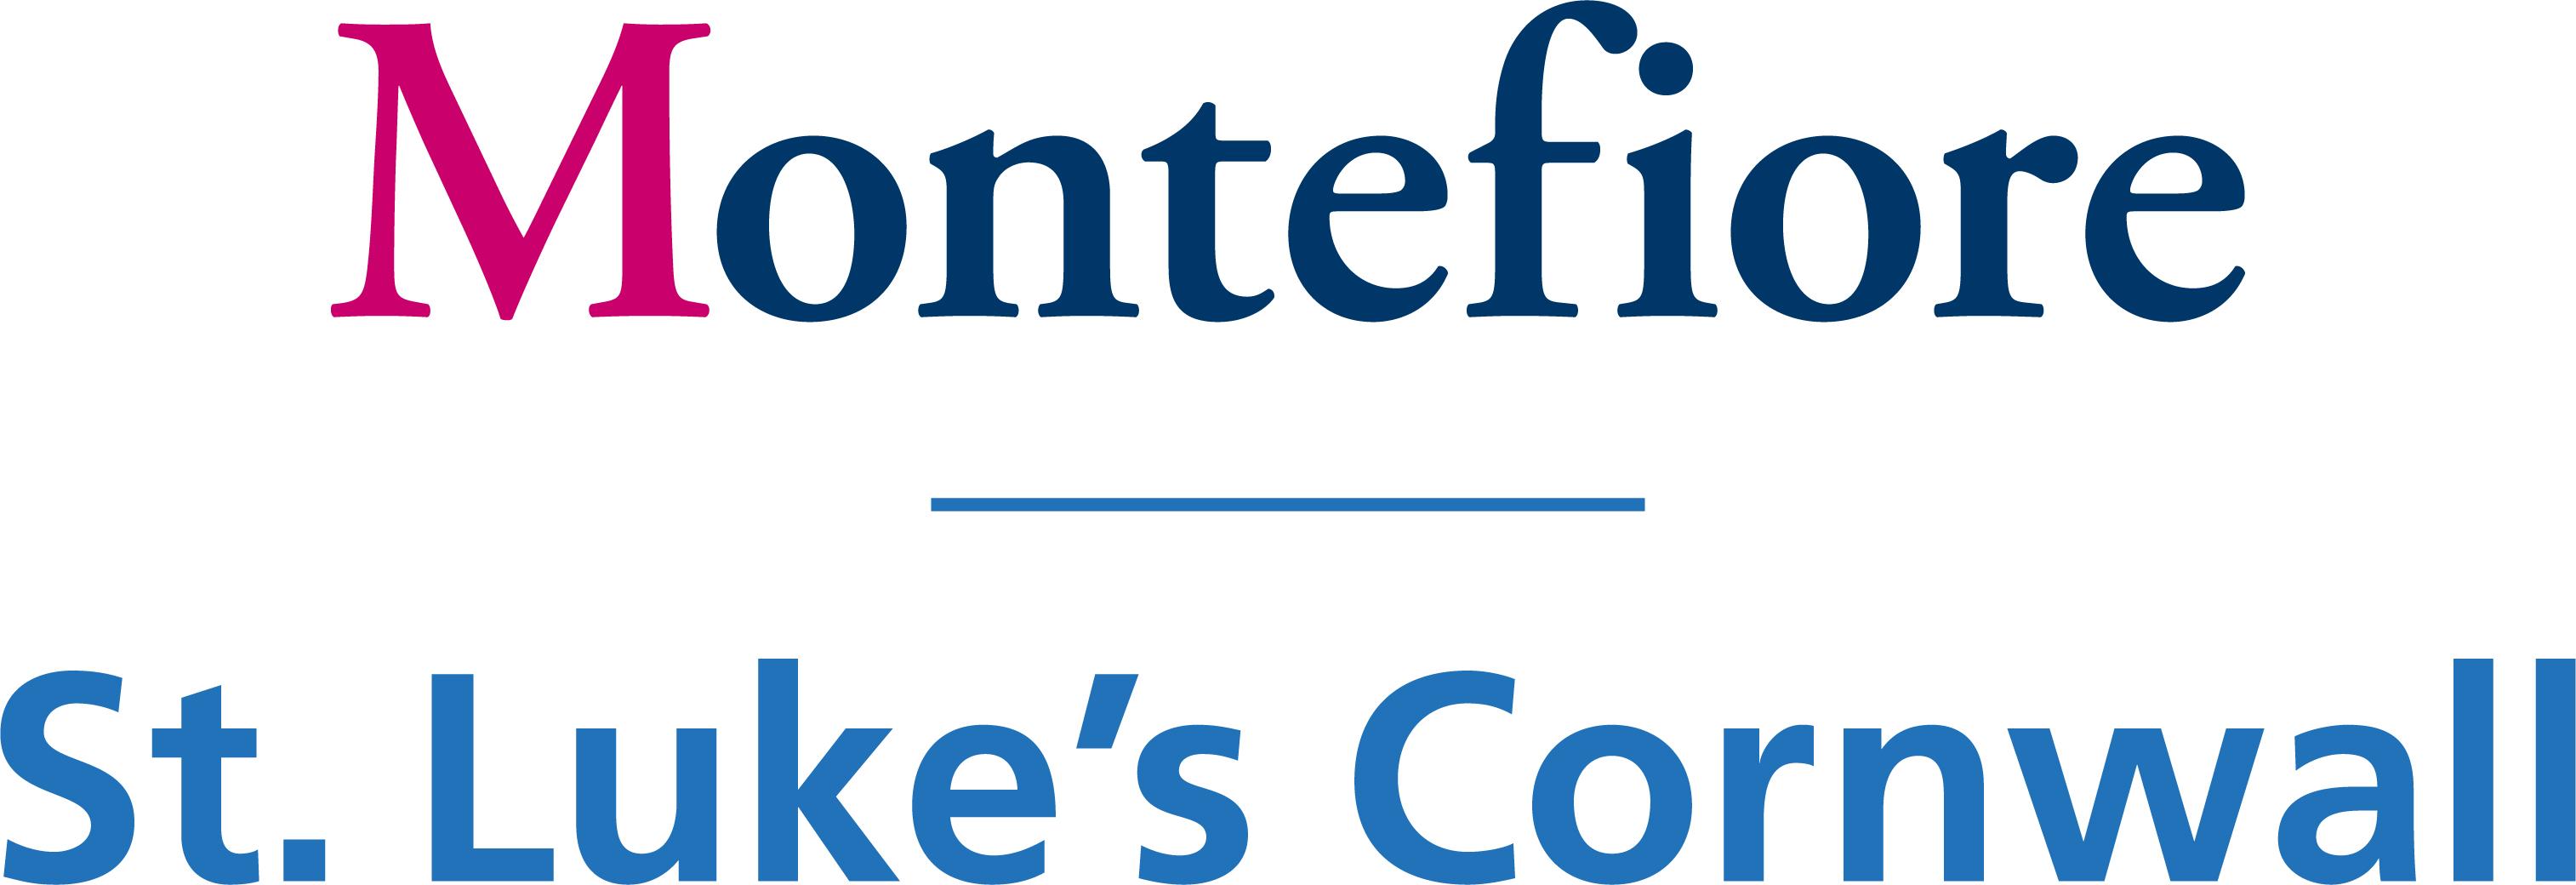 Montefiore St Lukes